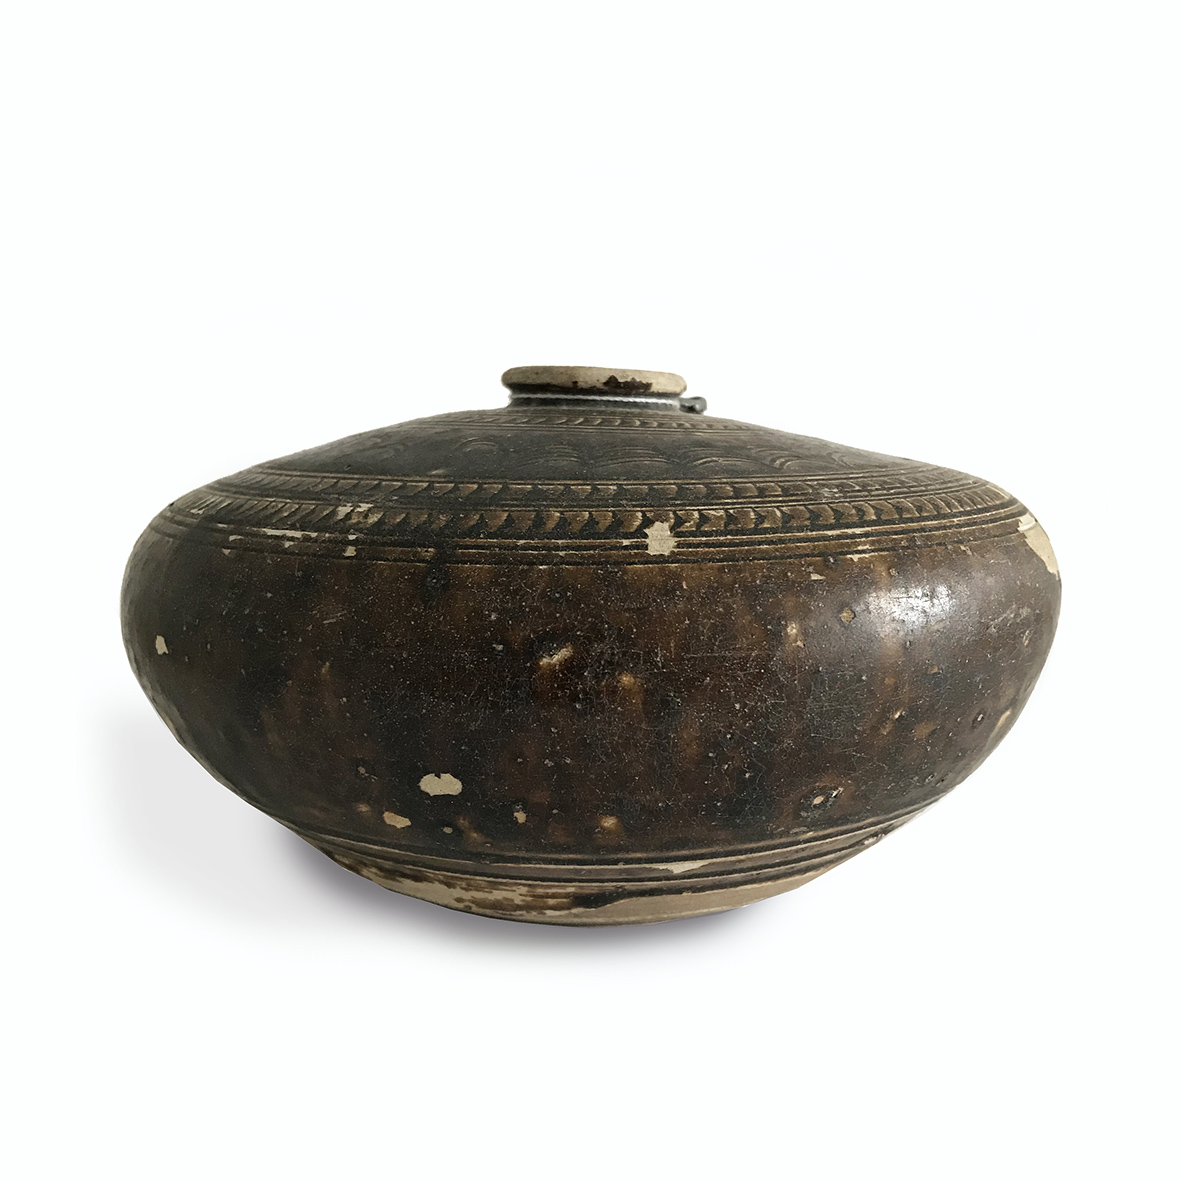 Khmer jar_ceramic_bayon period_Cambodia_basedonart gallery